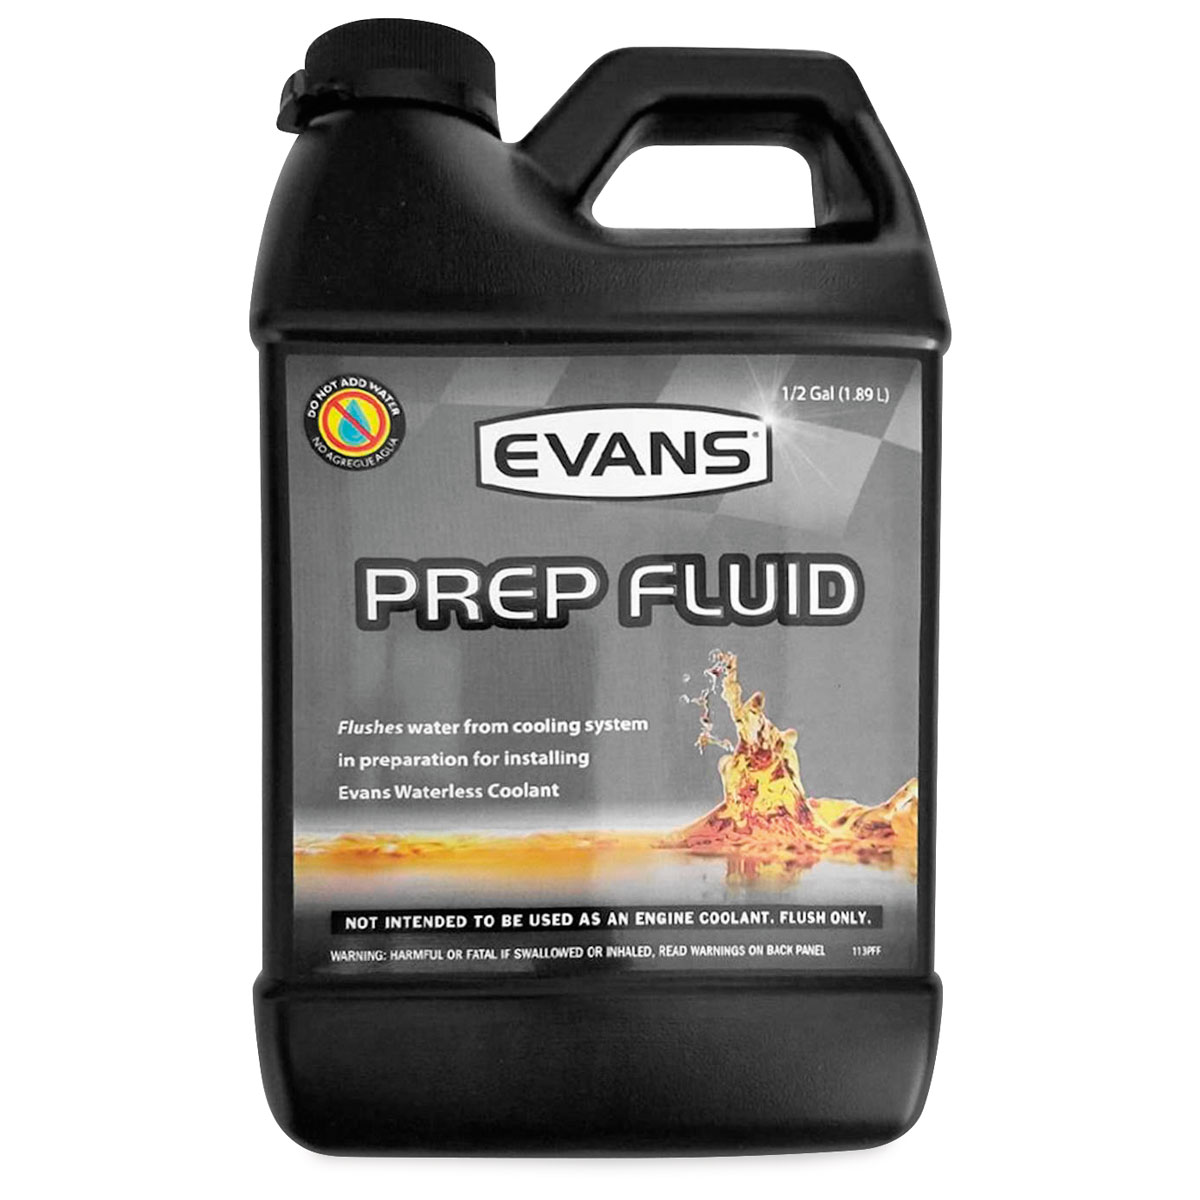 Evans Waterless Coolant Prep Fluid